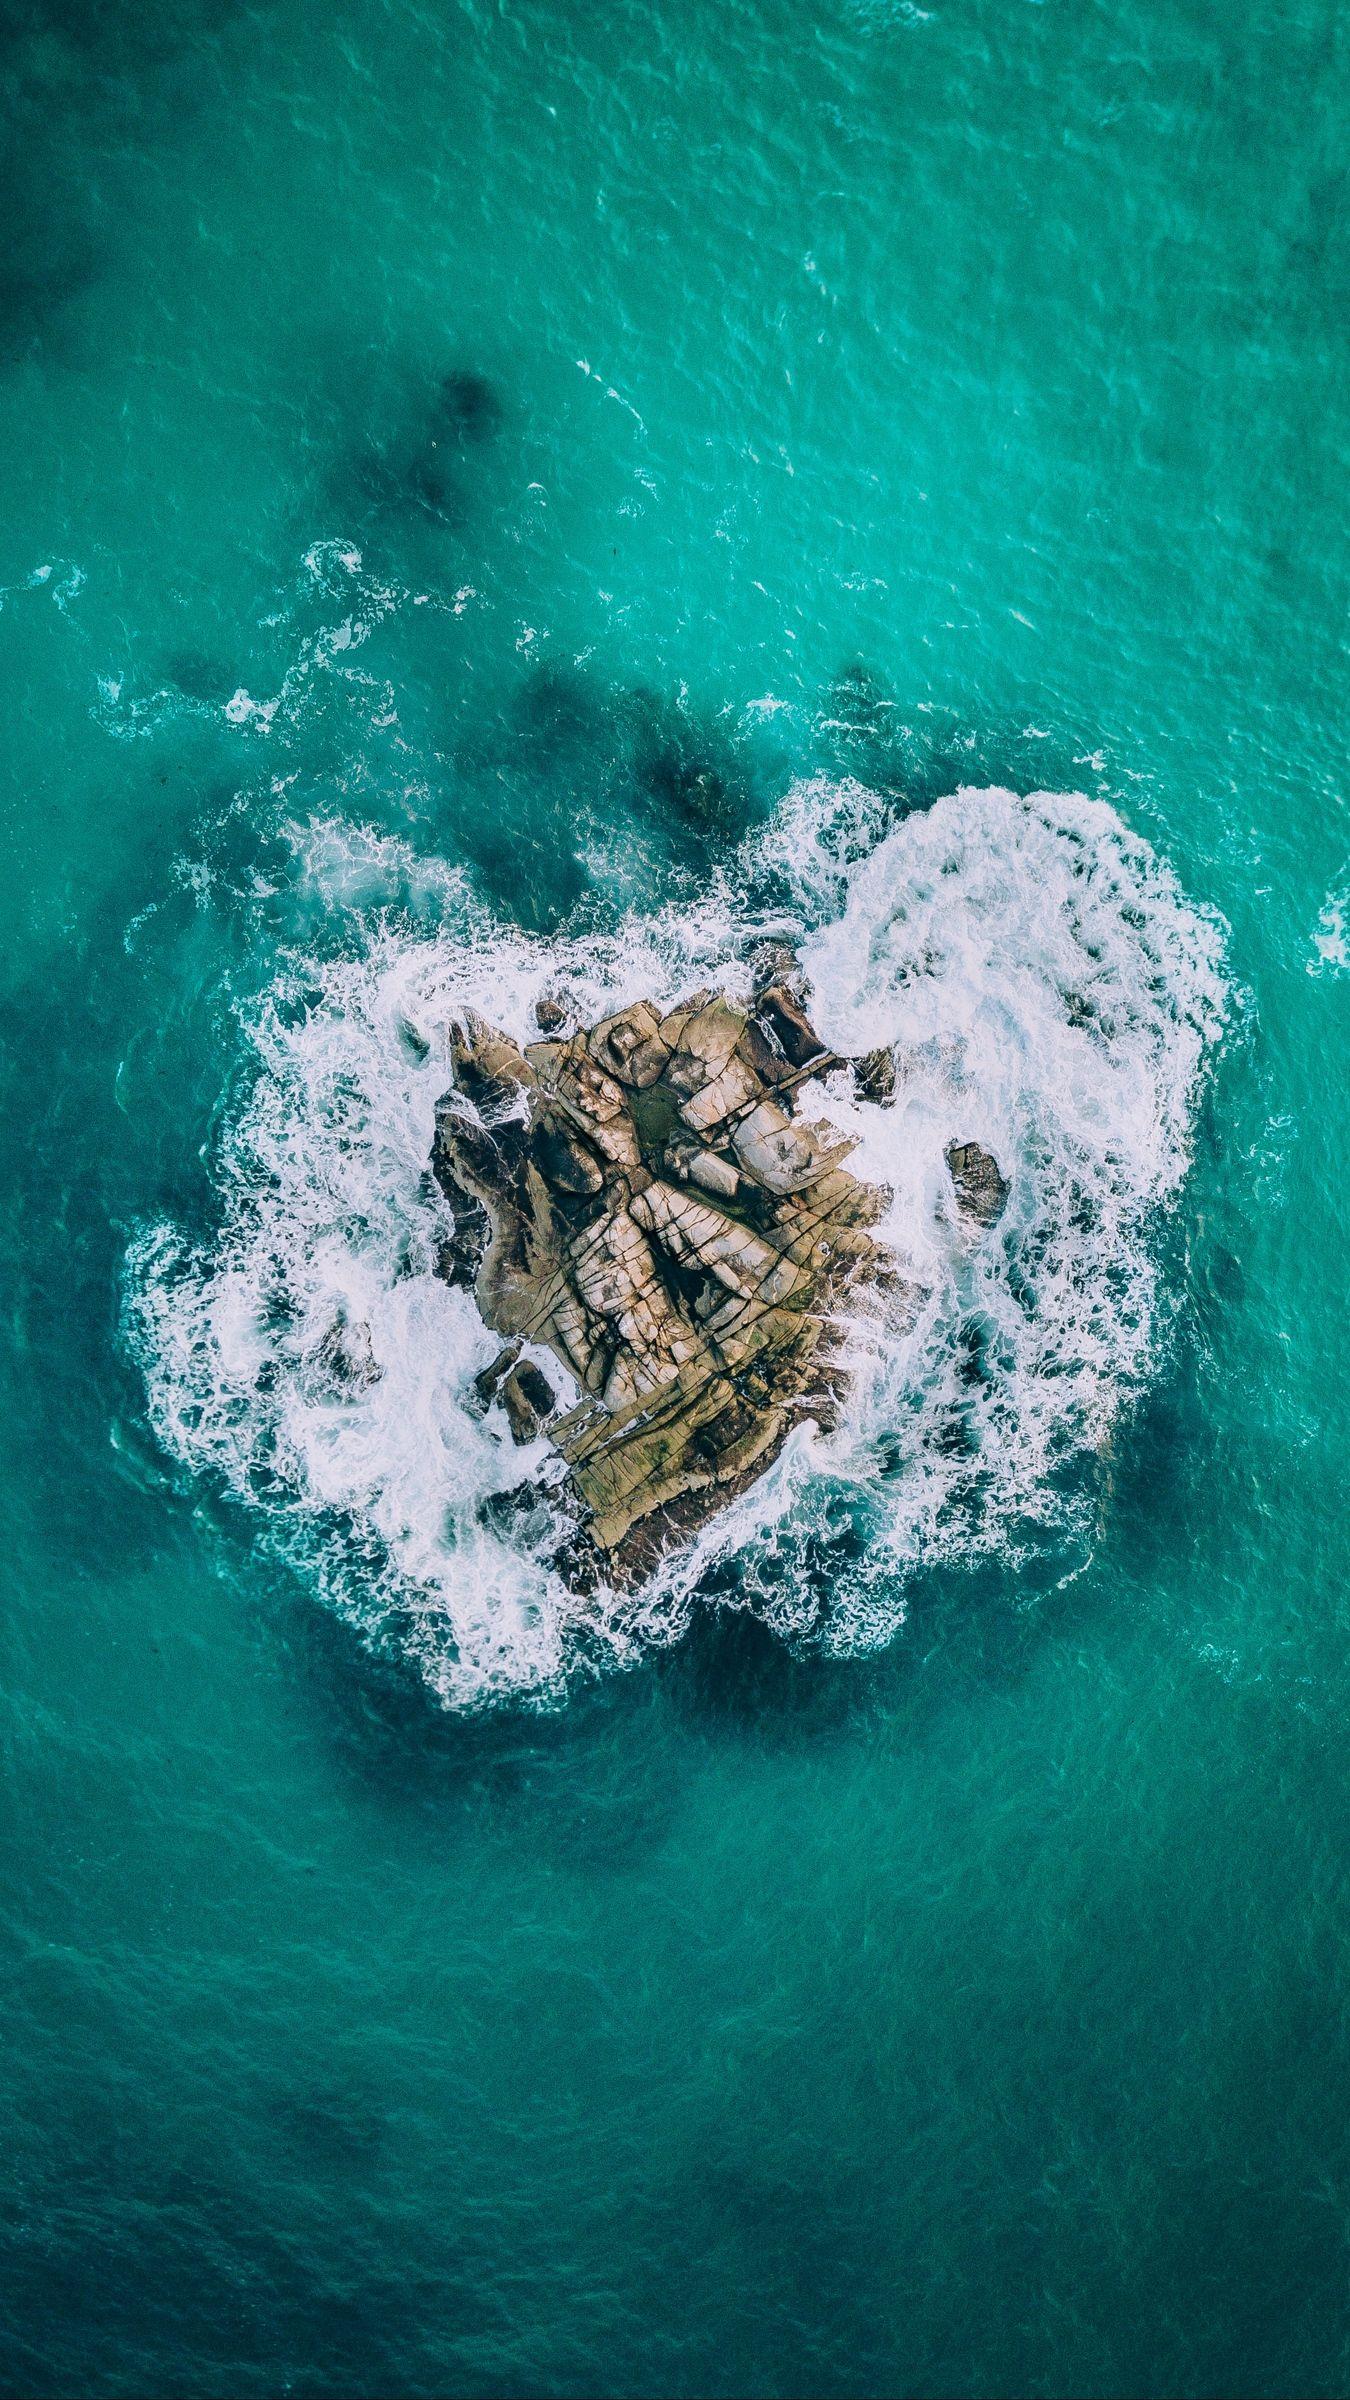 Download Wallpaper 1350x2400 Island Ocean Rocks Surf Iphone 8 7 6s 6 For Parallax Hd Back Ocean Wallpaper Nature Wallpaper Beautiful Landscape Wallpaper